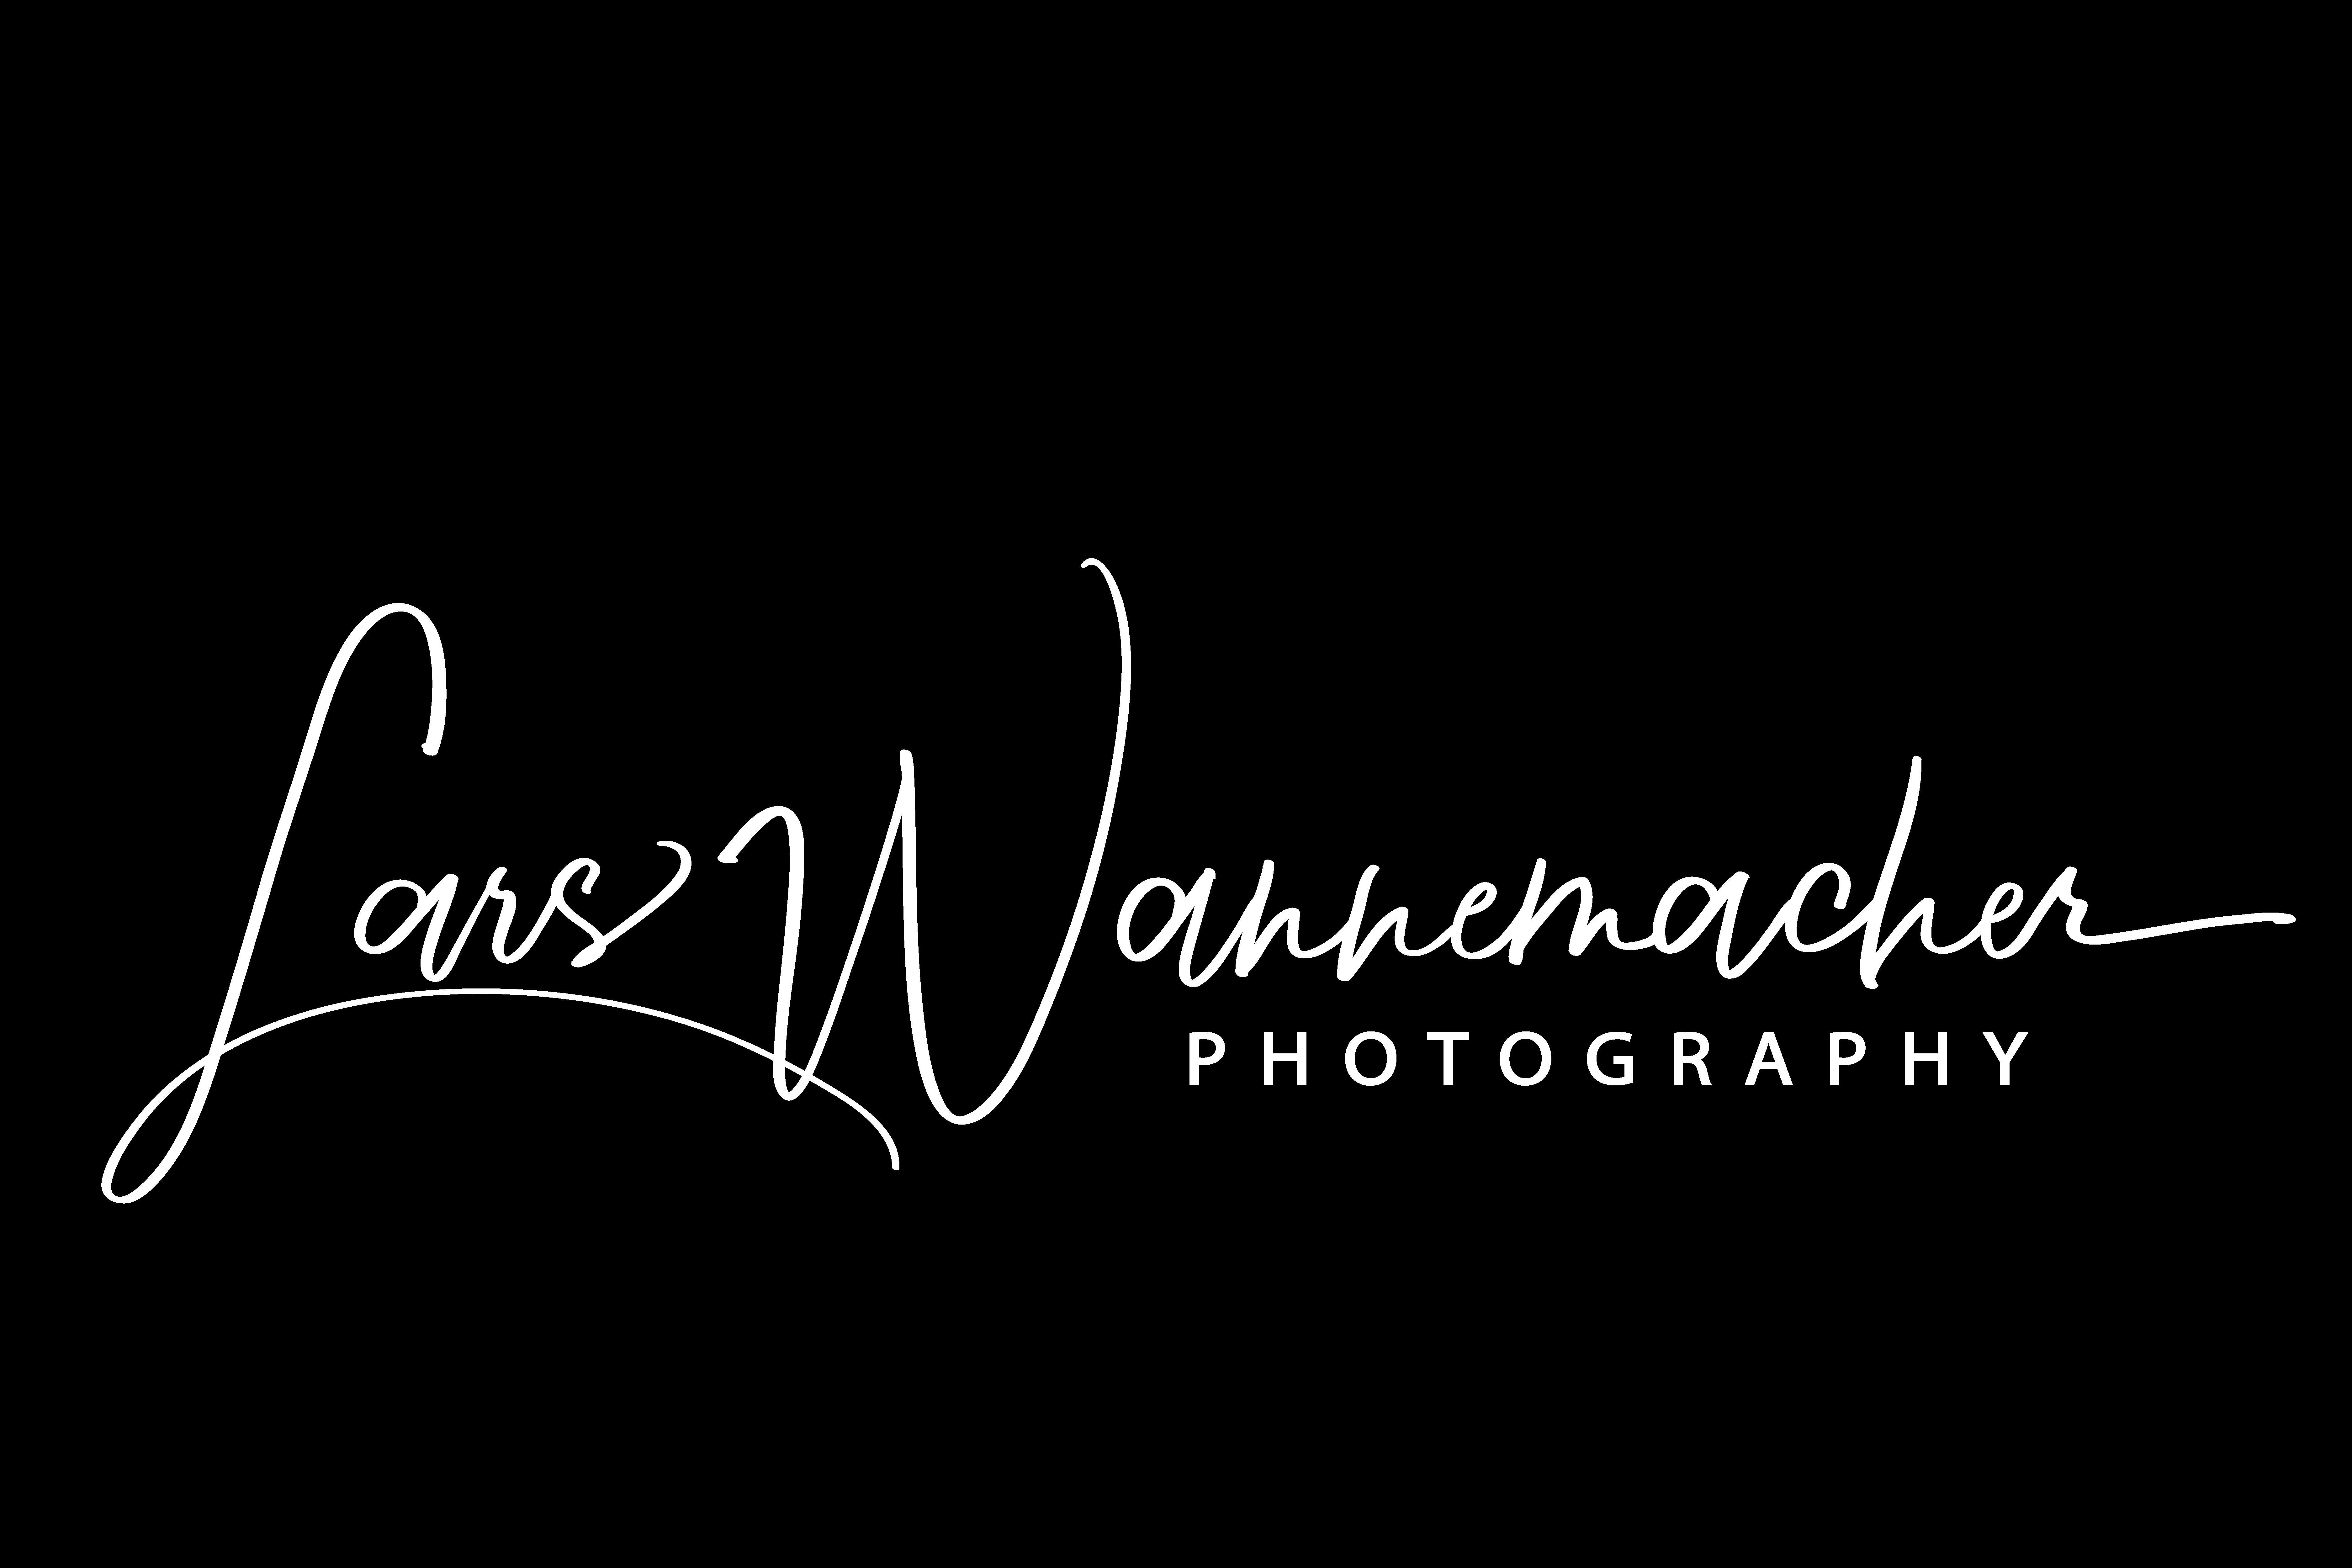 Lars Wannemacher Photography